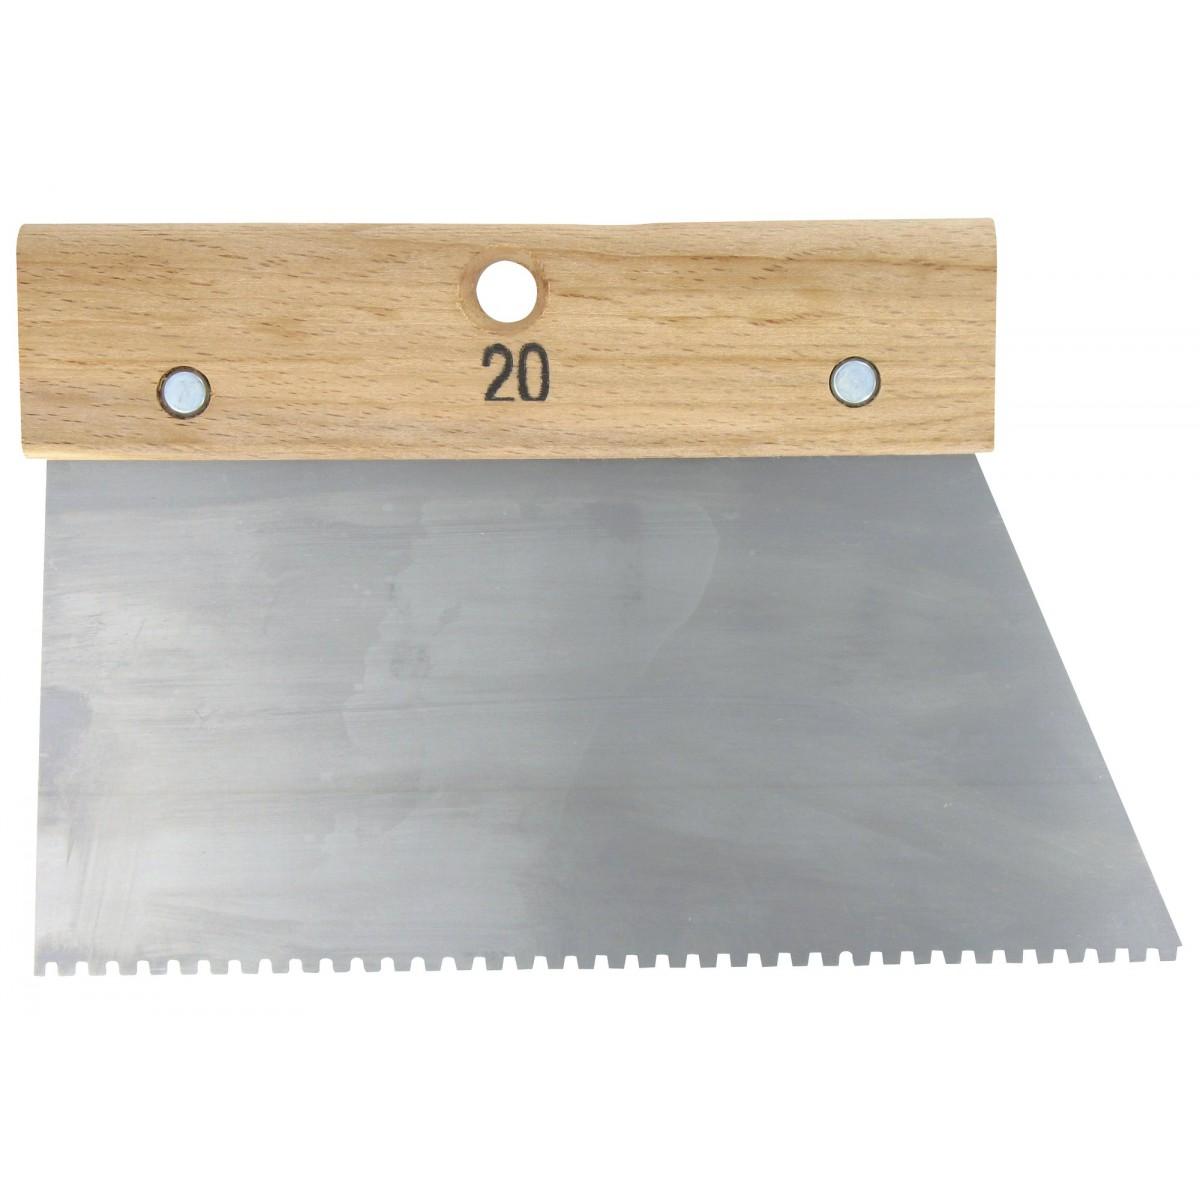 couteau colle outibat denture carr e normale 2 5 x 2 5 mm dimensions 200 mm. Black Bedroom Furniture Sets. Home Design Ideas